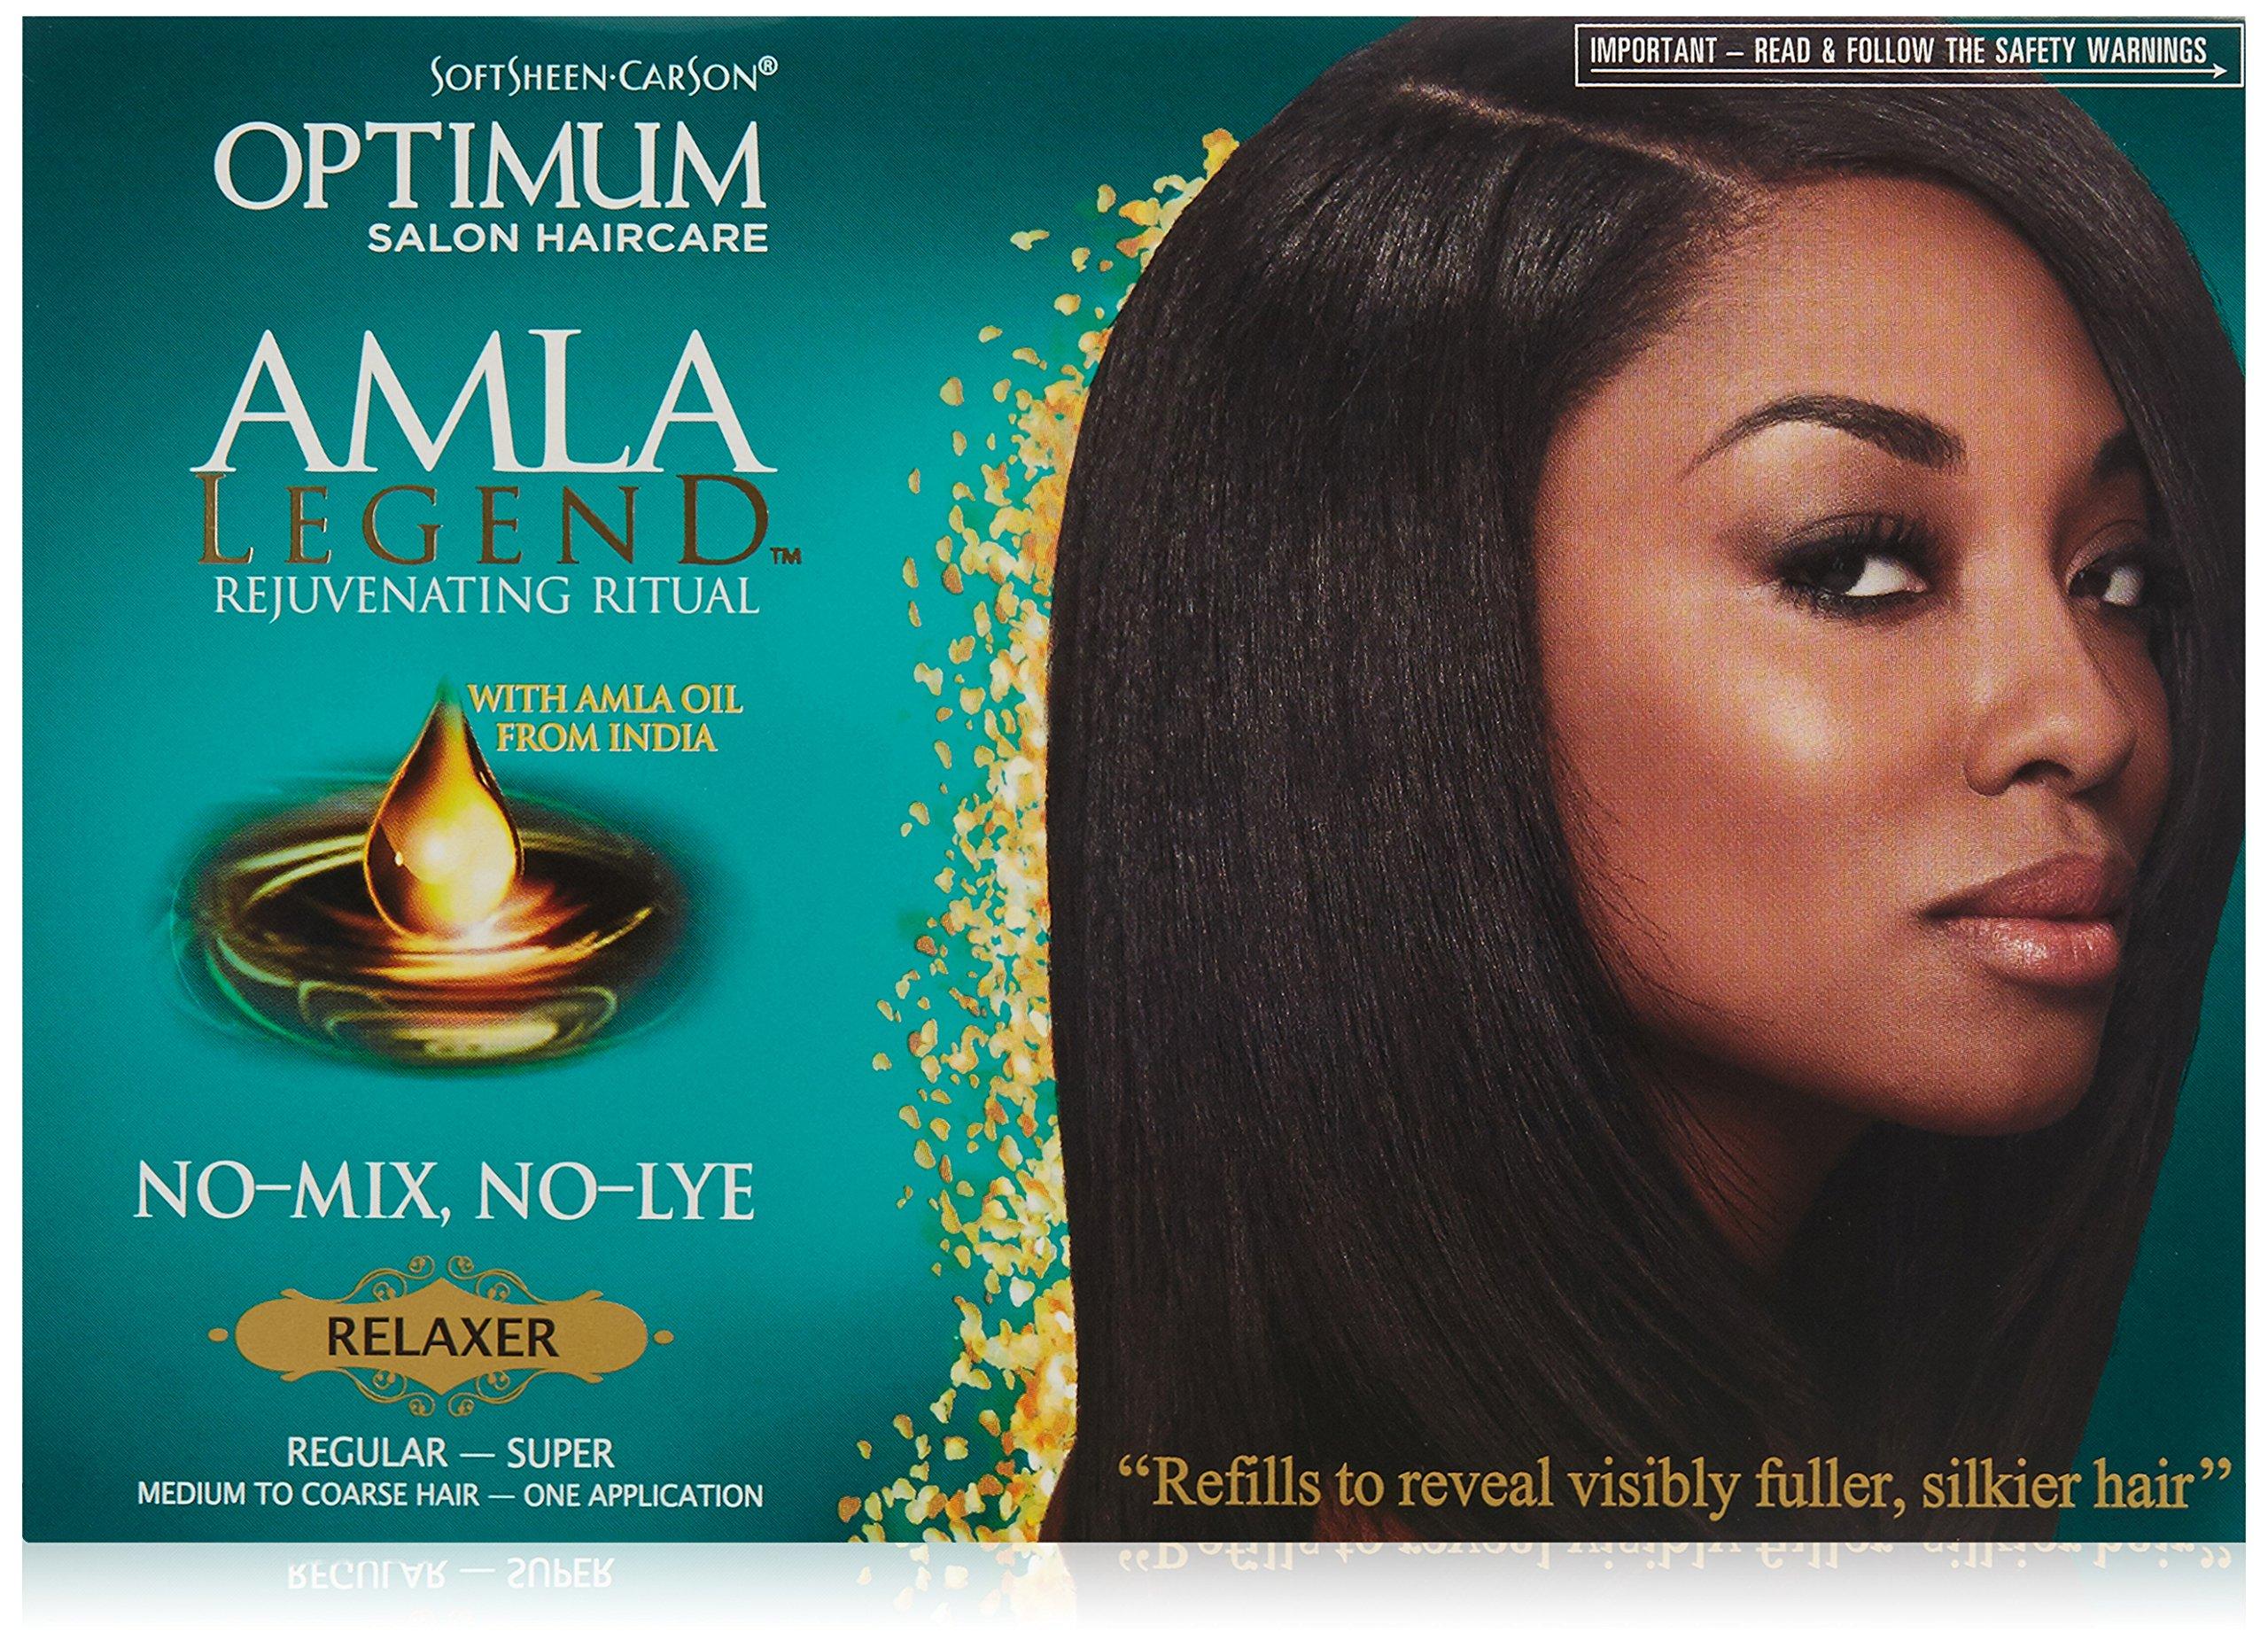 Softsheen Carson Optimum Amla Legend Relaxer Kit